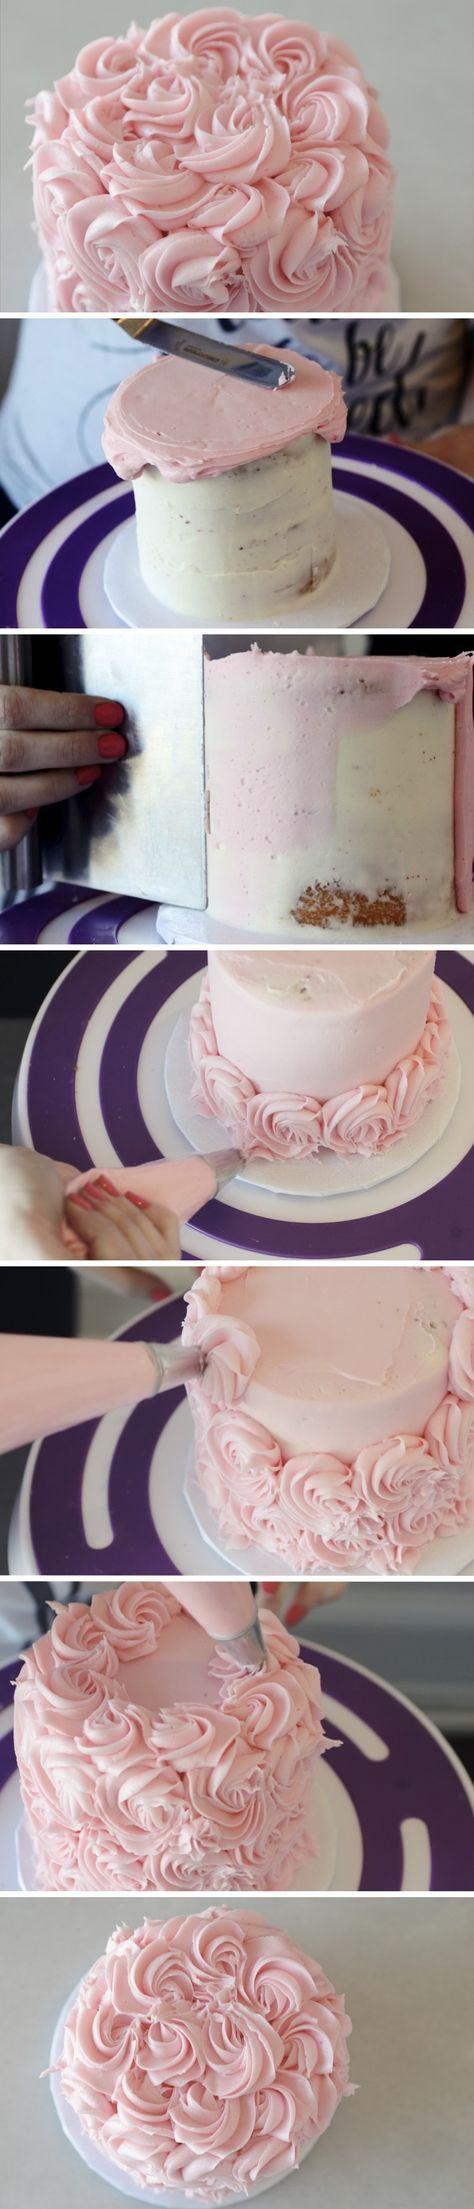 How to Frost a Rose Cake   Relish.com More #yummycakes